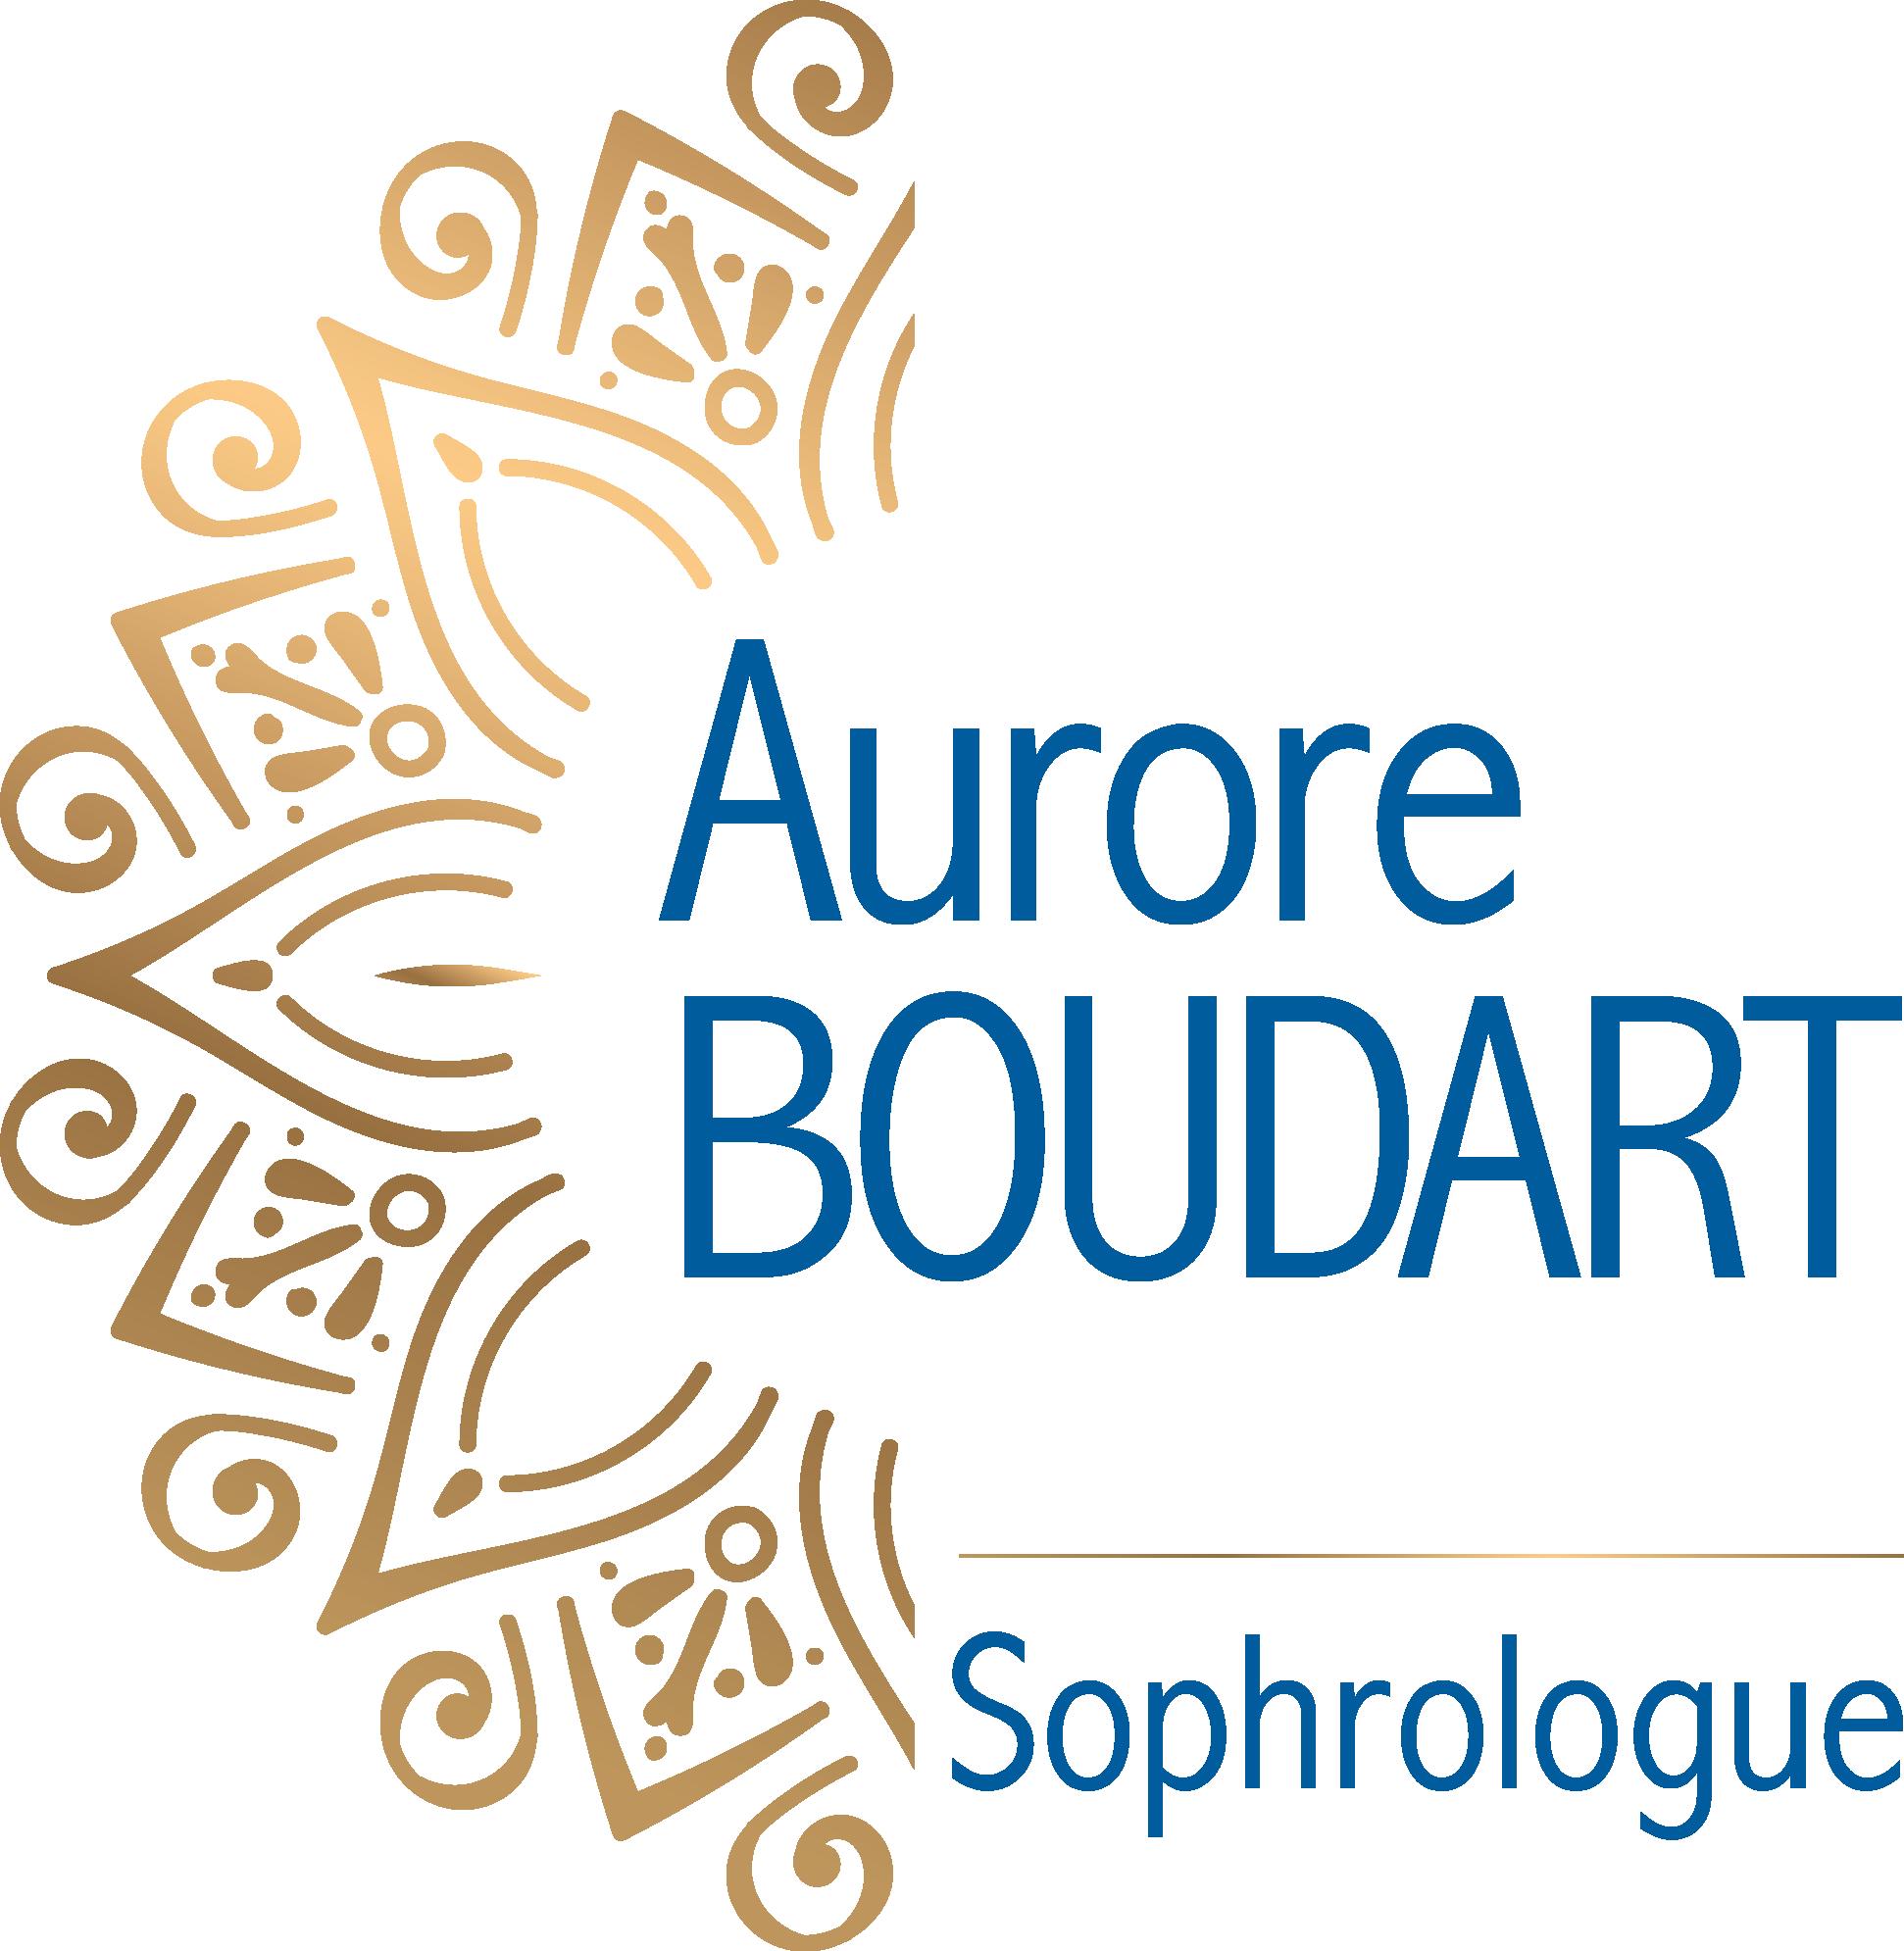 LOGO AURORE BOUDART